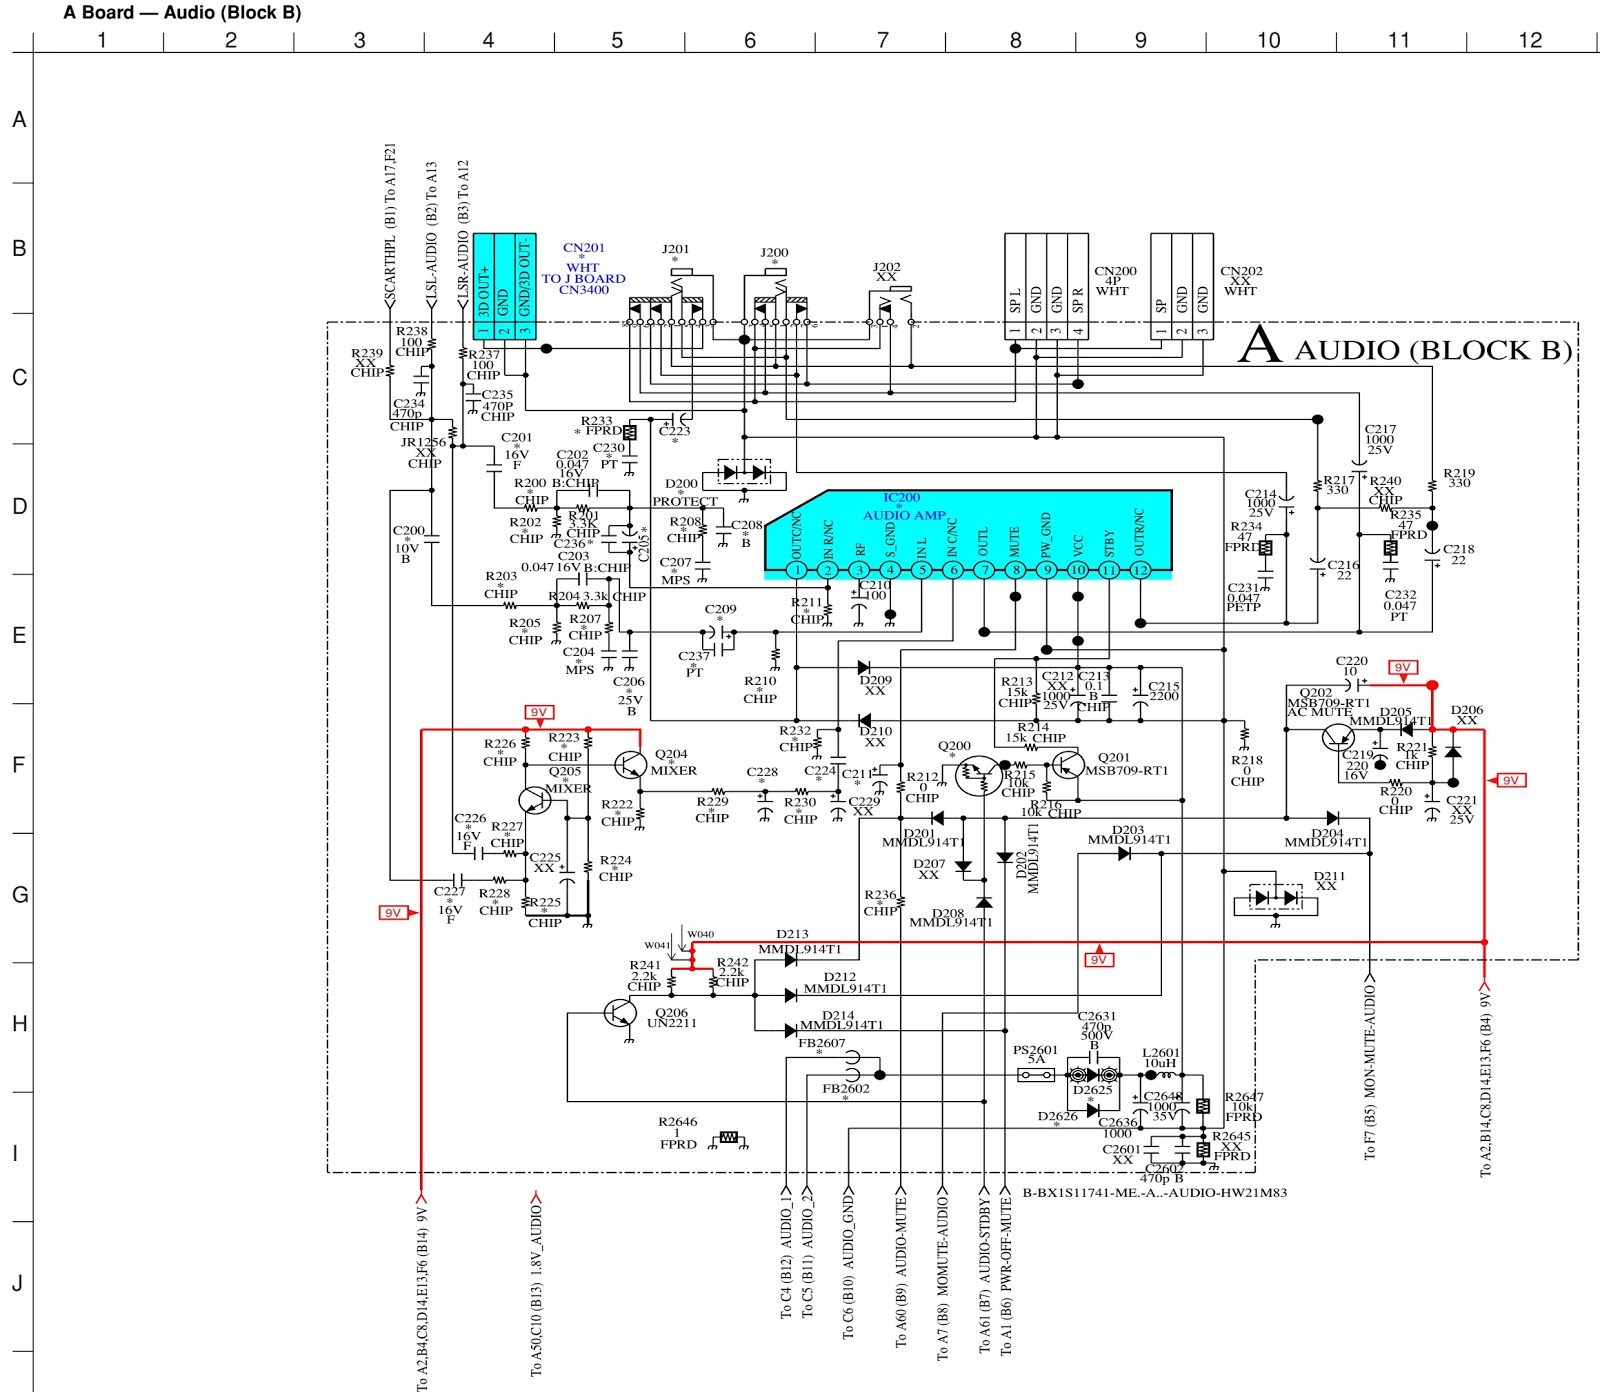 medium resolution of sony tv circuit diagram wiring diagram name sony tv circuit diagram pdf sony tv circuit diagram